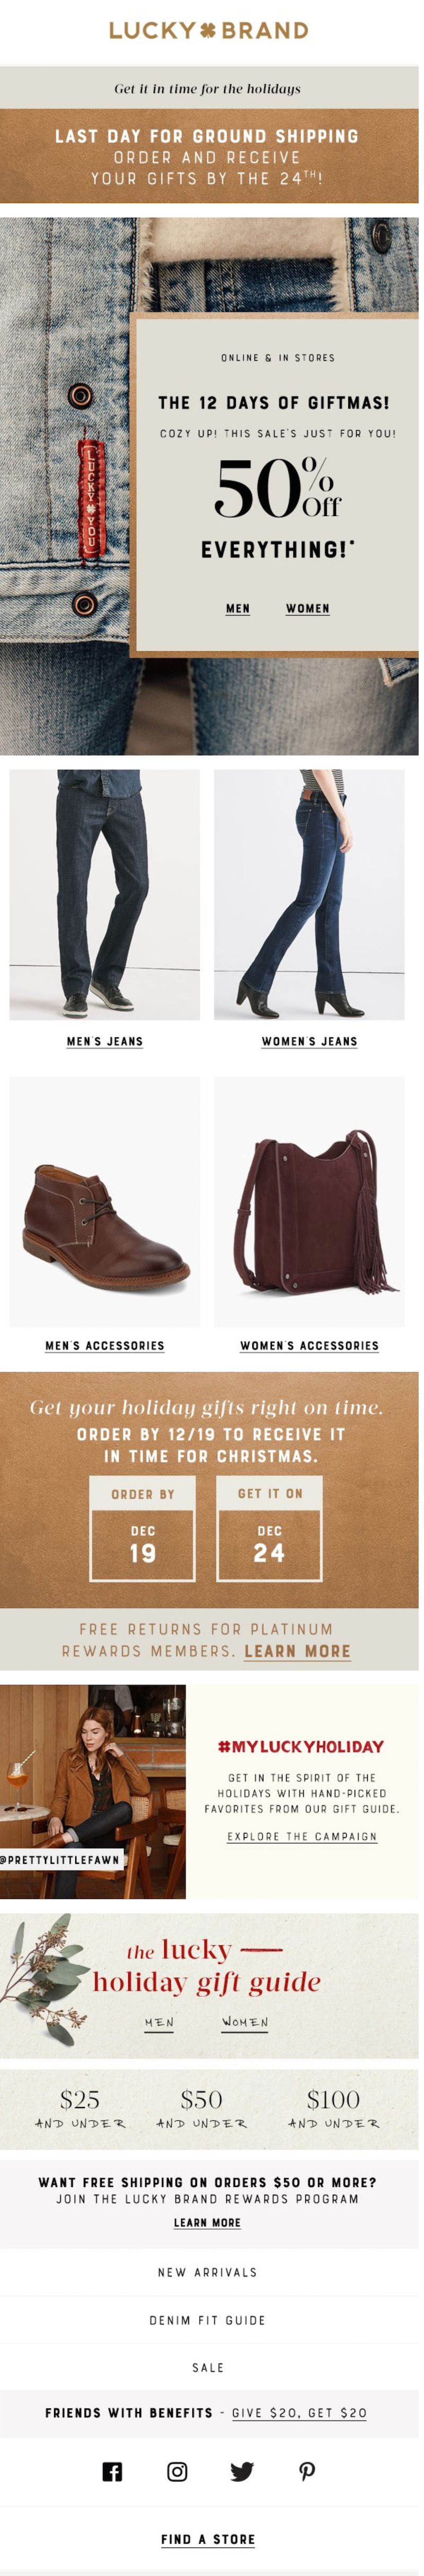 Christmas marketing email